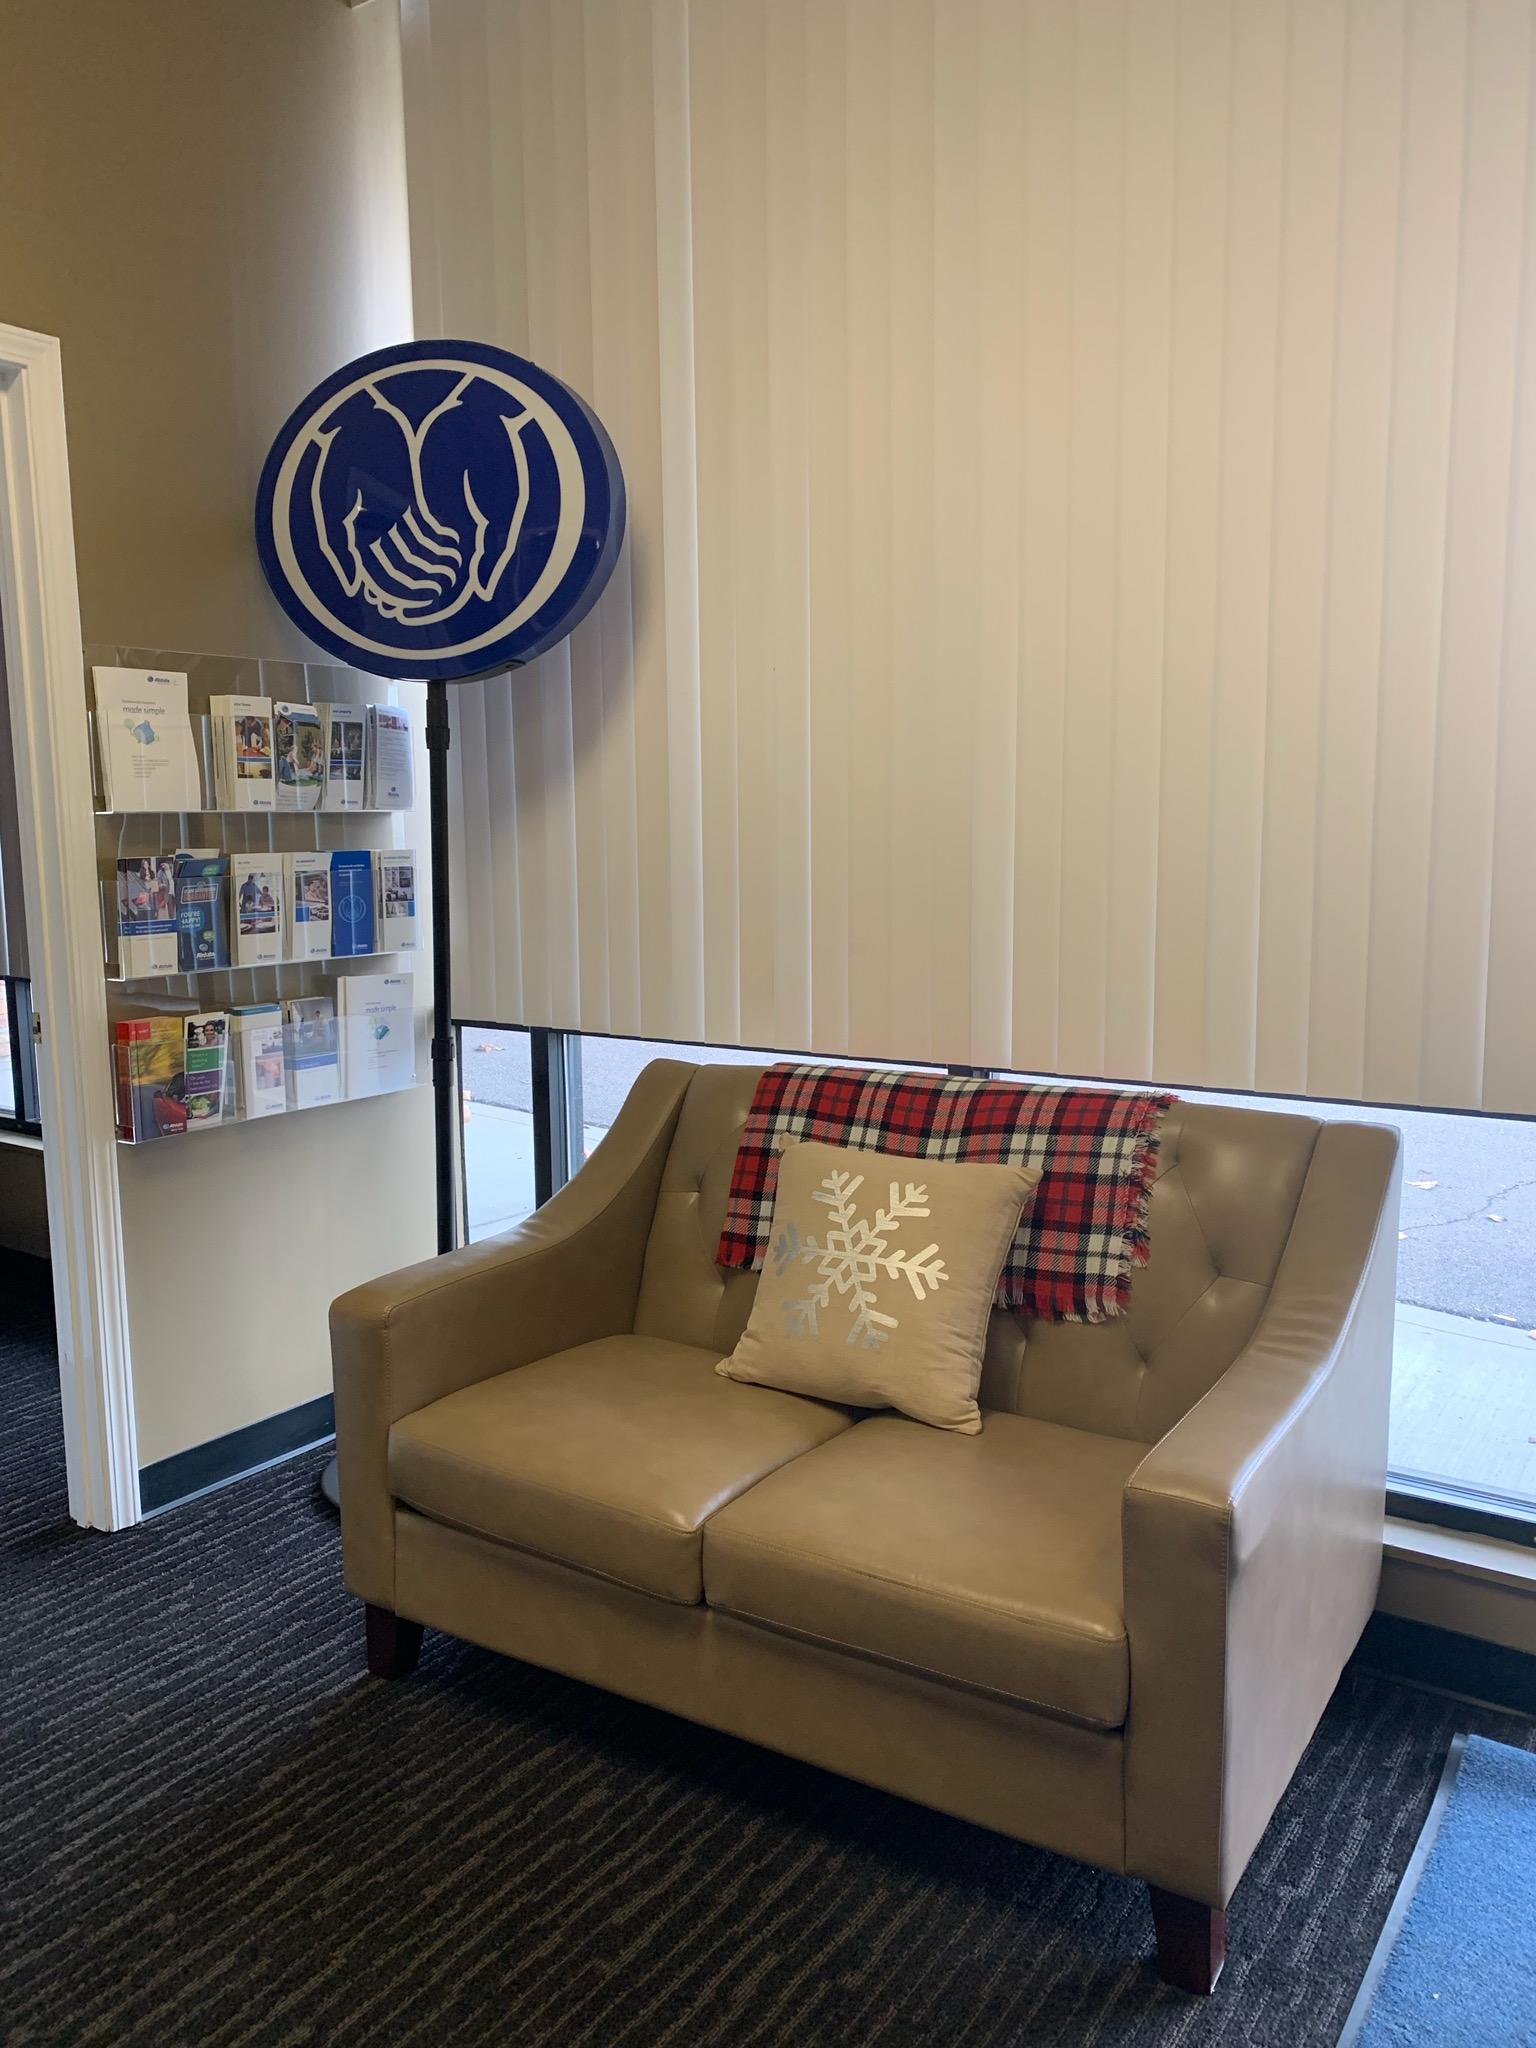 Allstate Insurance Agent: Nikki Smith image 2